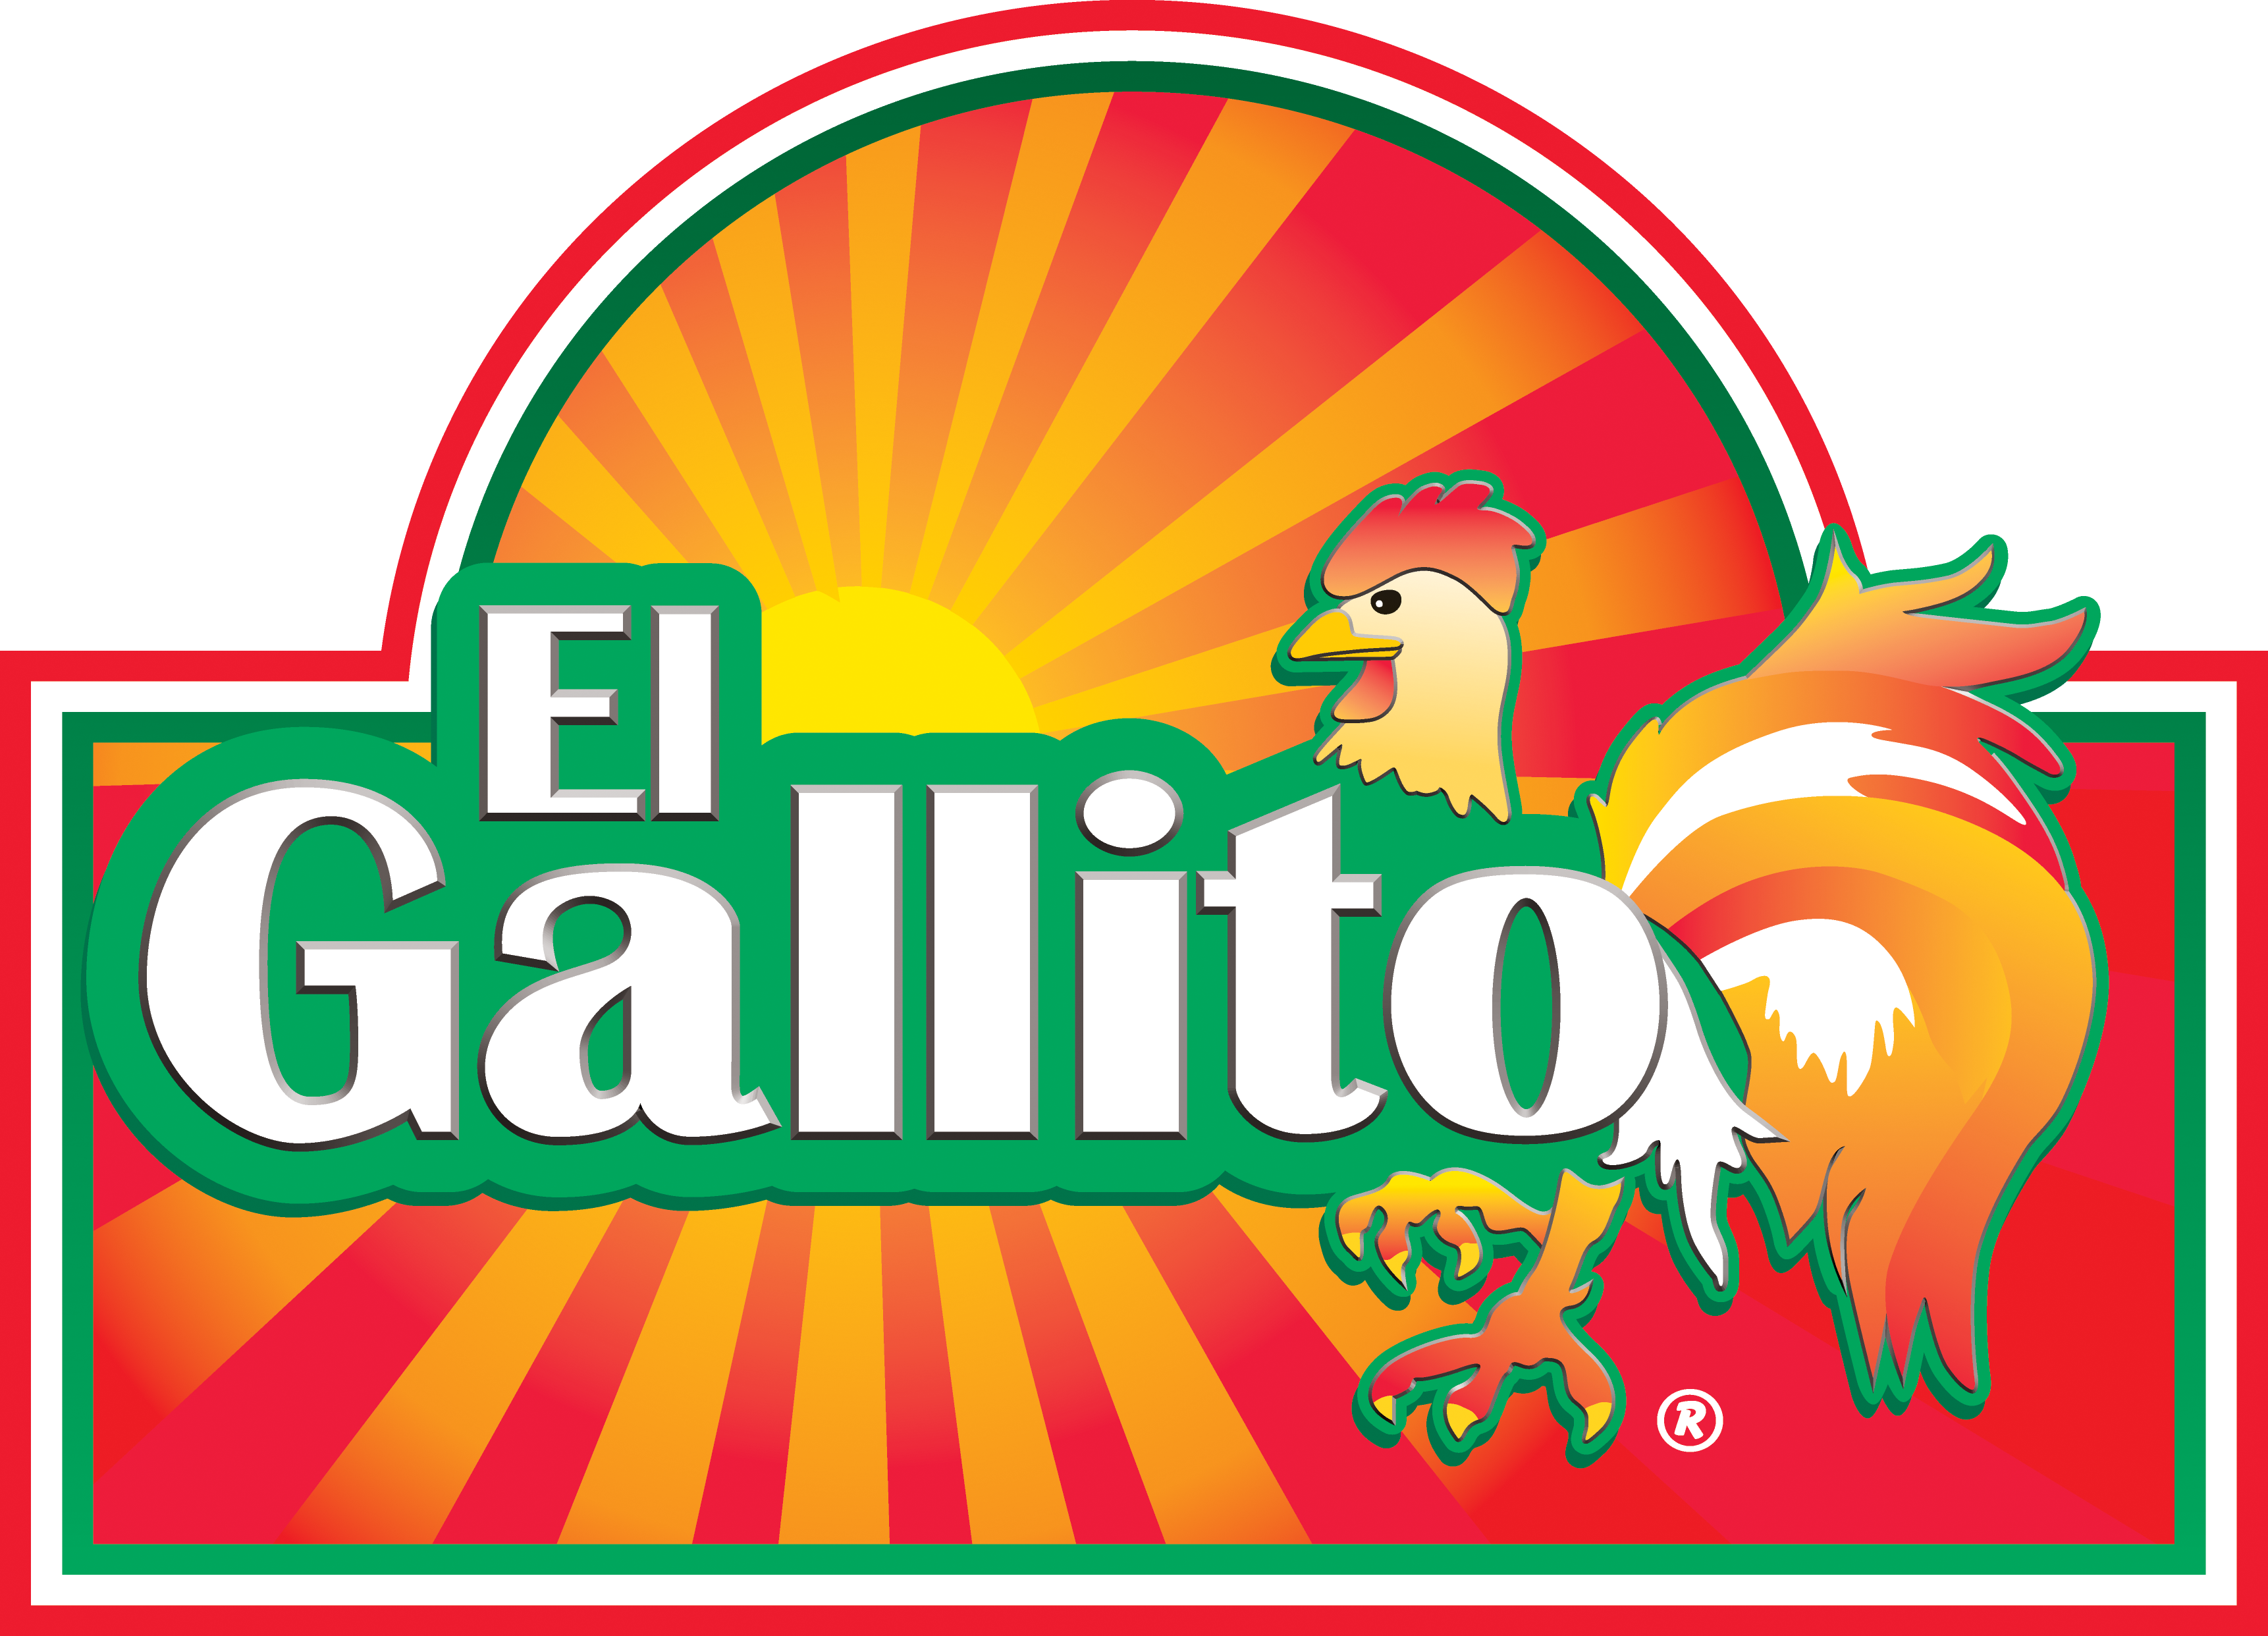 https://0201.nccdn.net/1_2/000/000/0ca/0b4/Gallito_Frame_logo-3444x2484.png